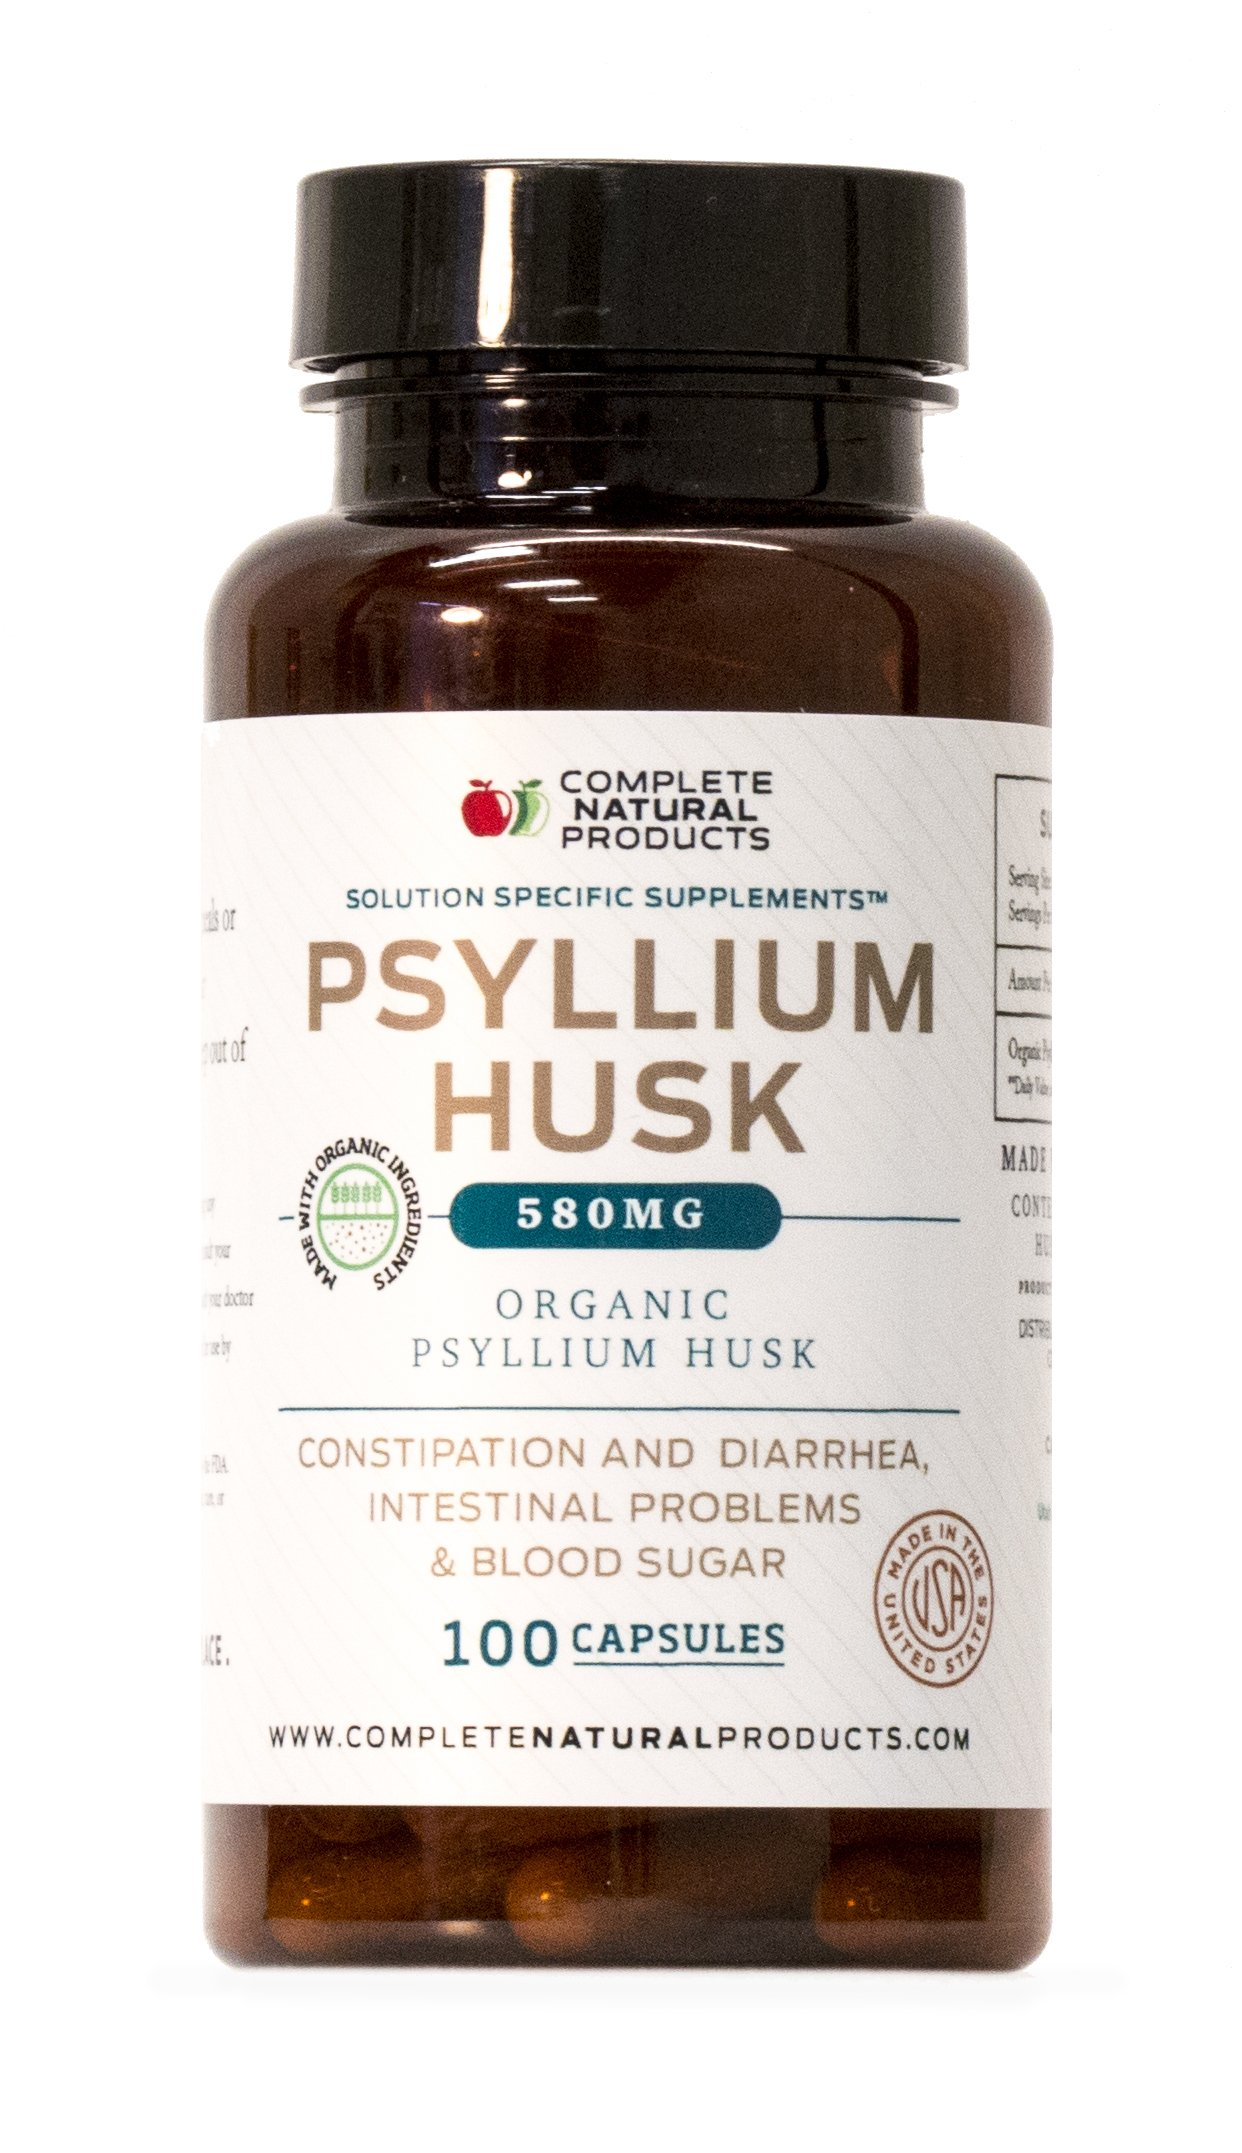 Organic Natural Whole Psyllium Husk Powder Capsules - 580mg Capsules 100 Pure Unflavored Fiber & Colon Cleanse Pills